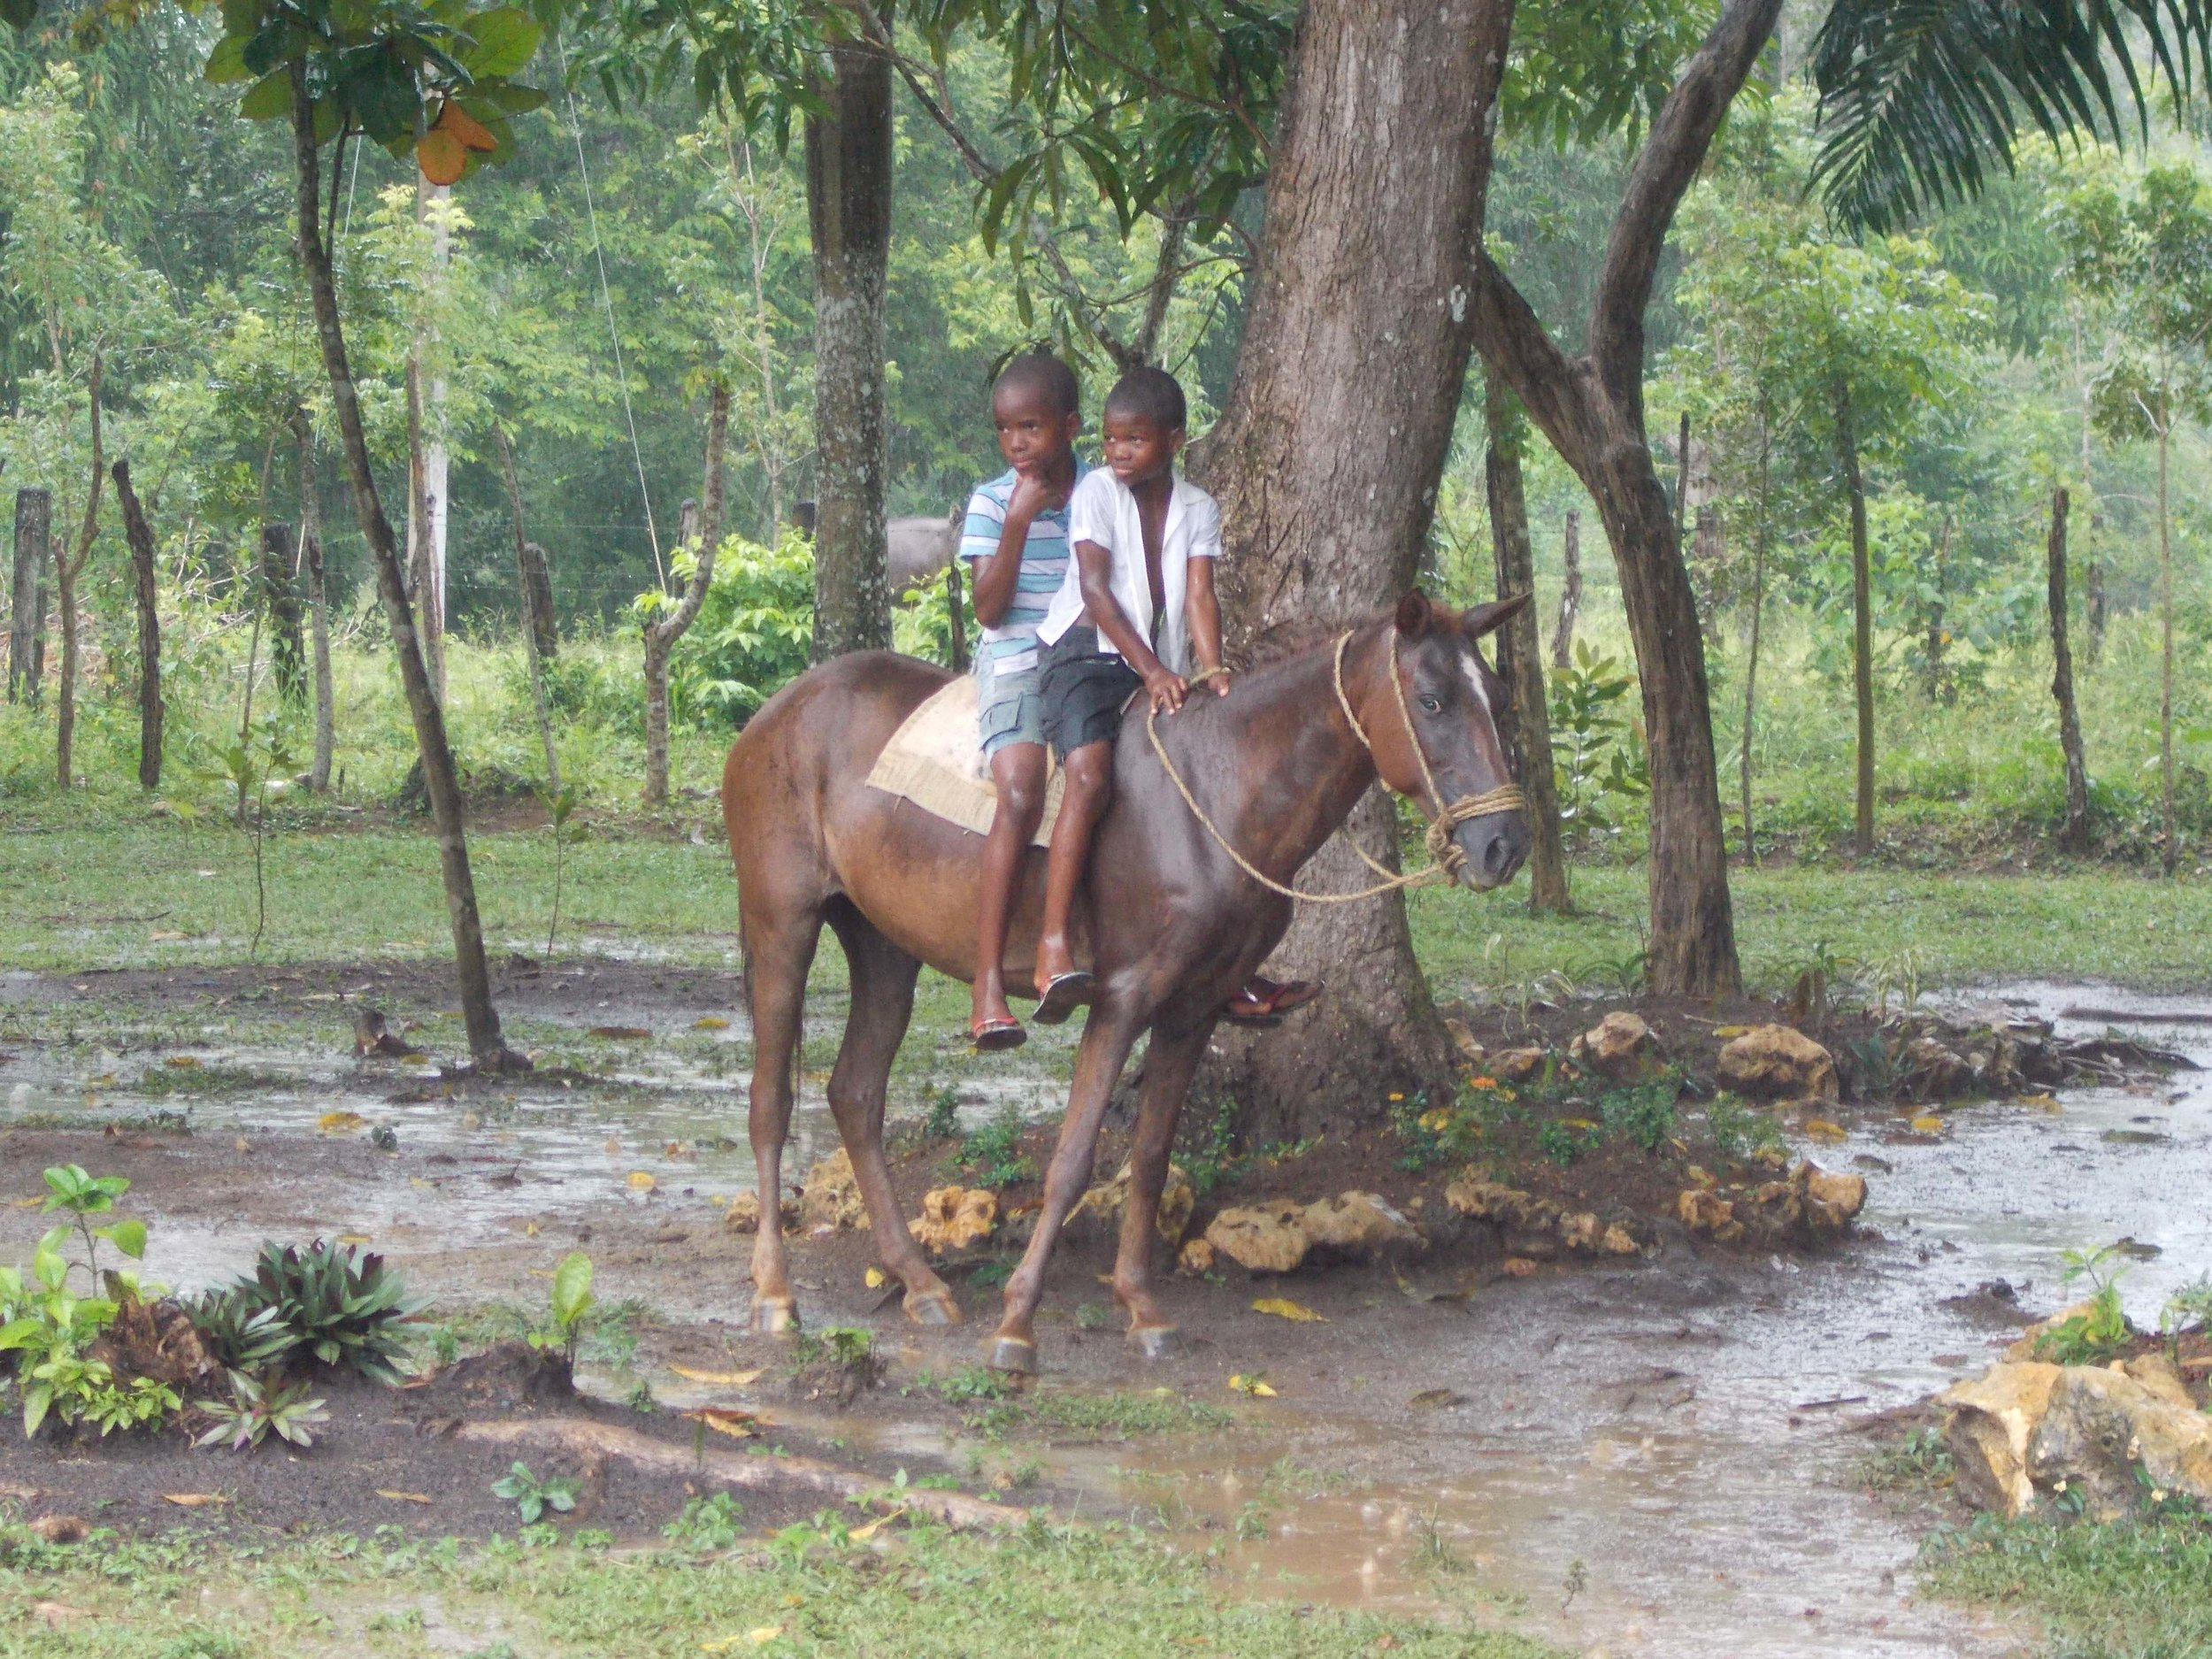 Cruz Verde boys on horse